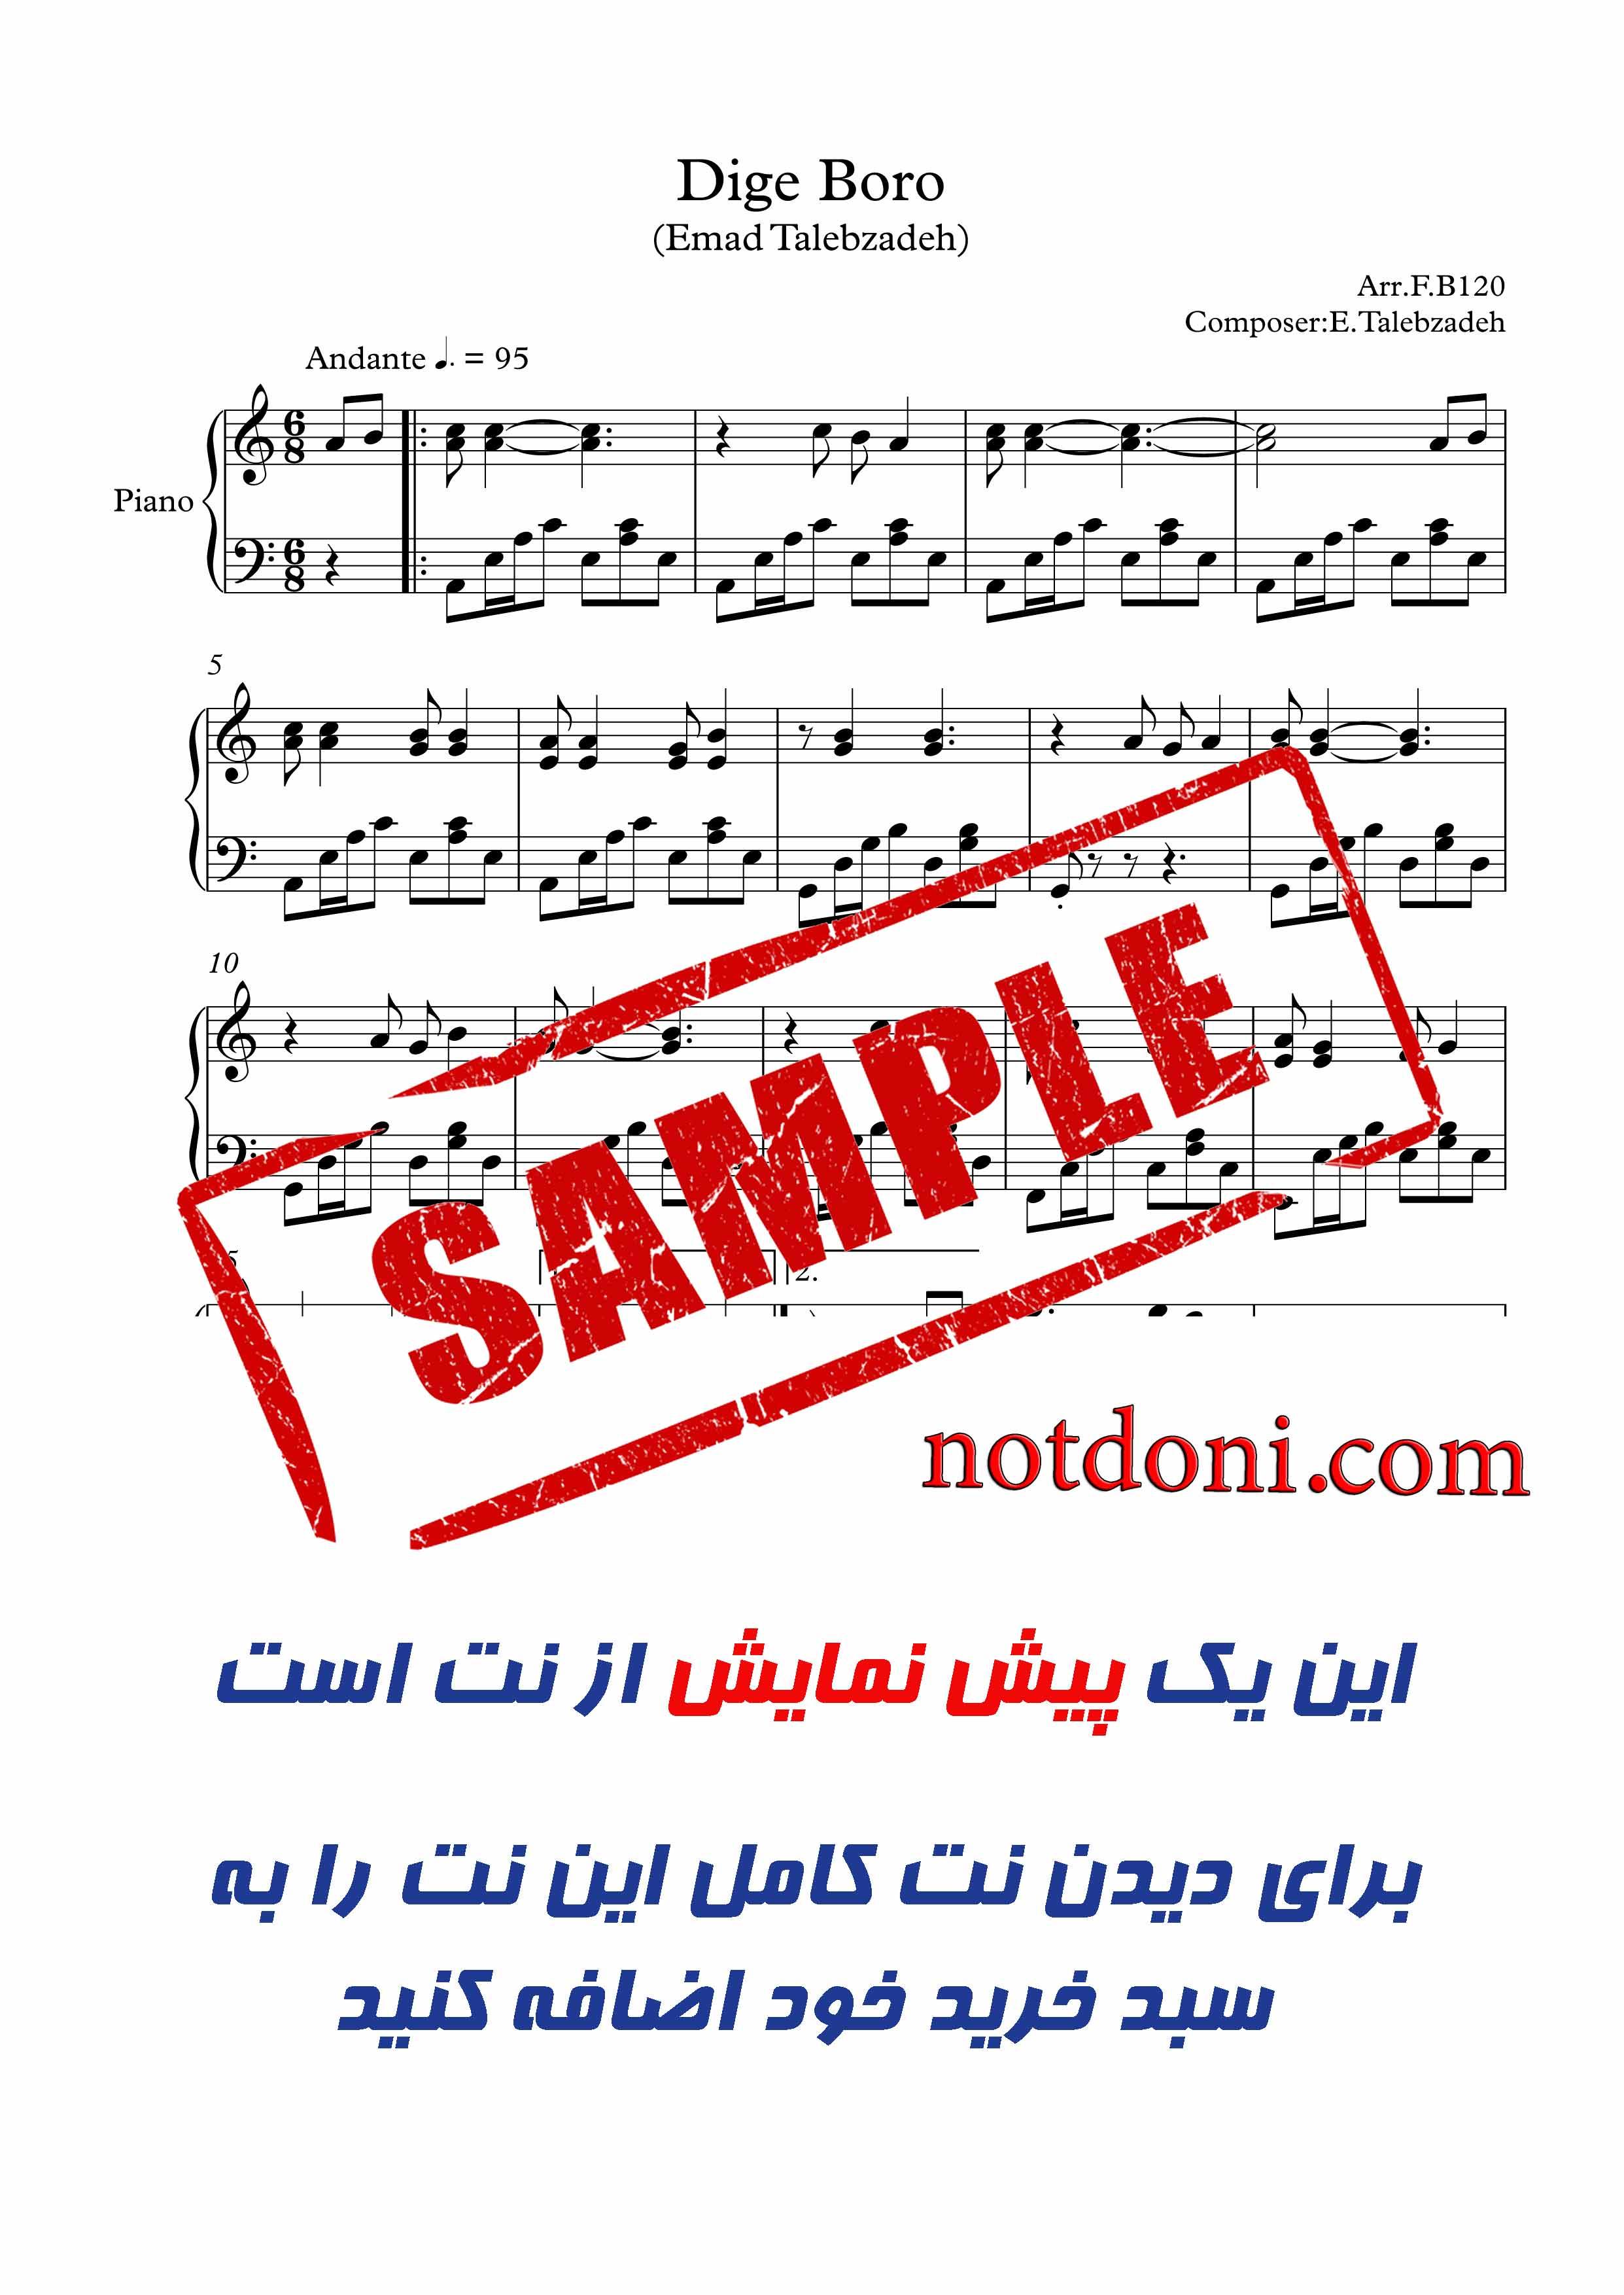 1022e9fc-2a2c-4ca4-af8e-f14ab755a78f_دموی-نت-آهنگ-دیگه-برو.jpg